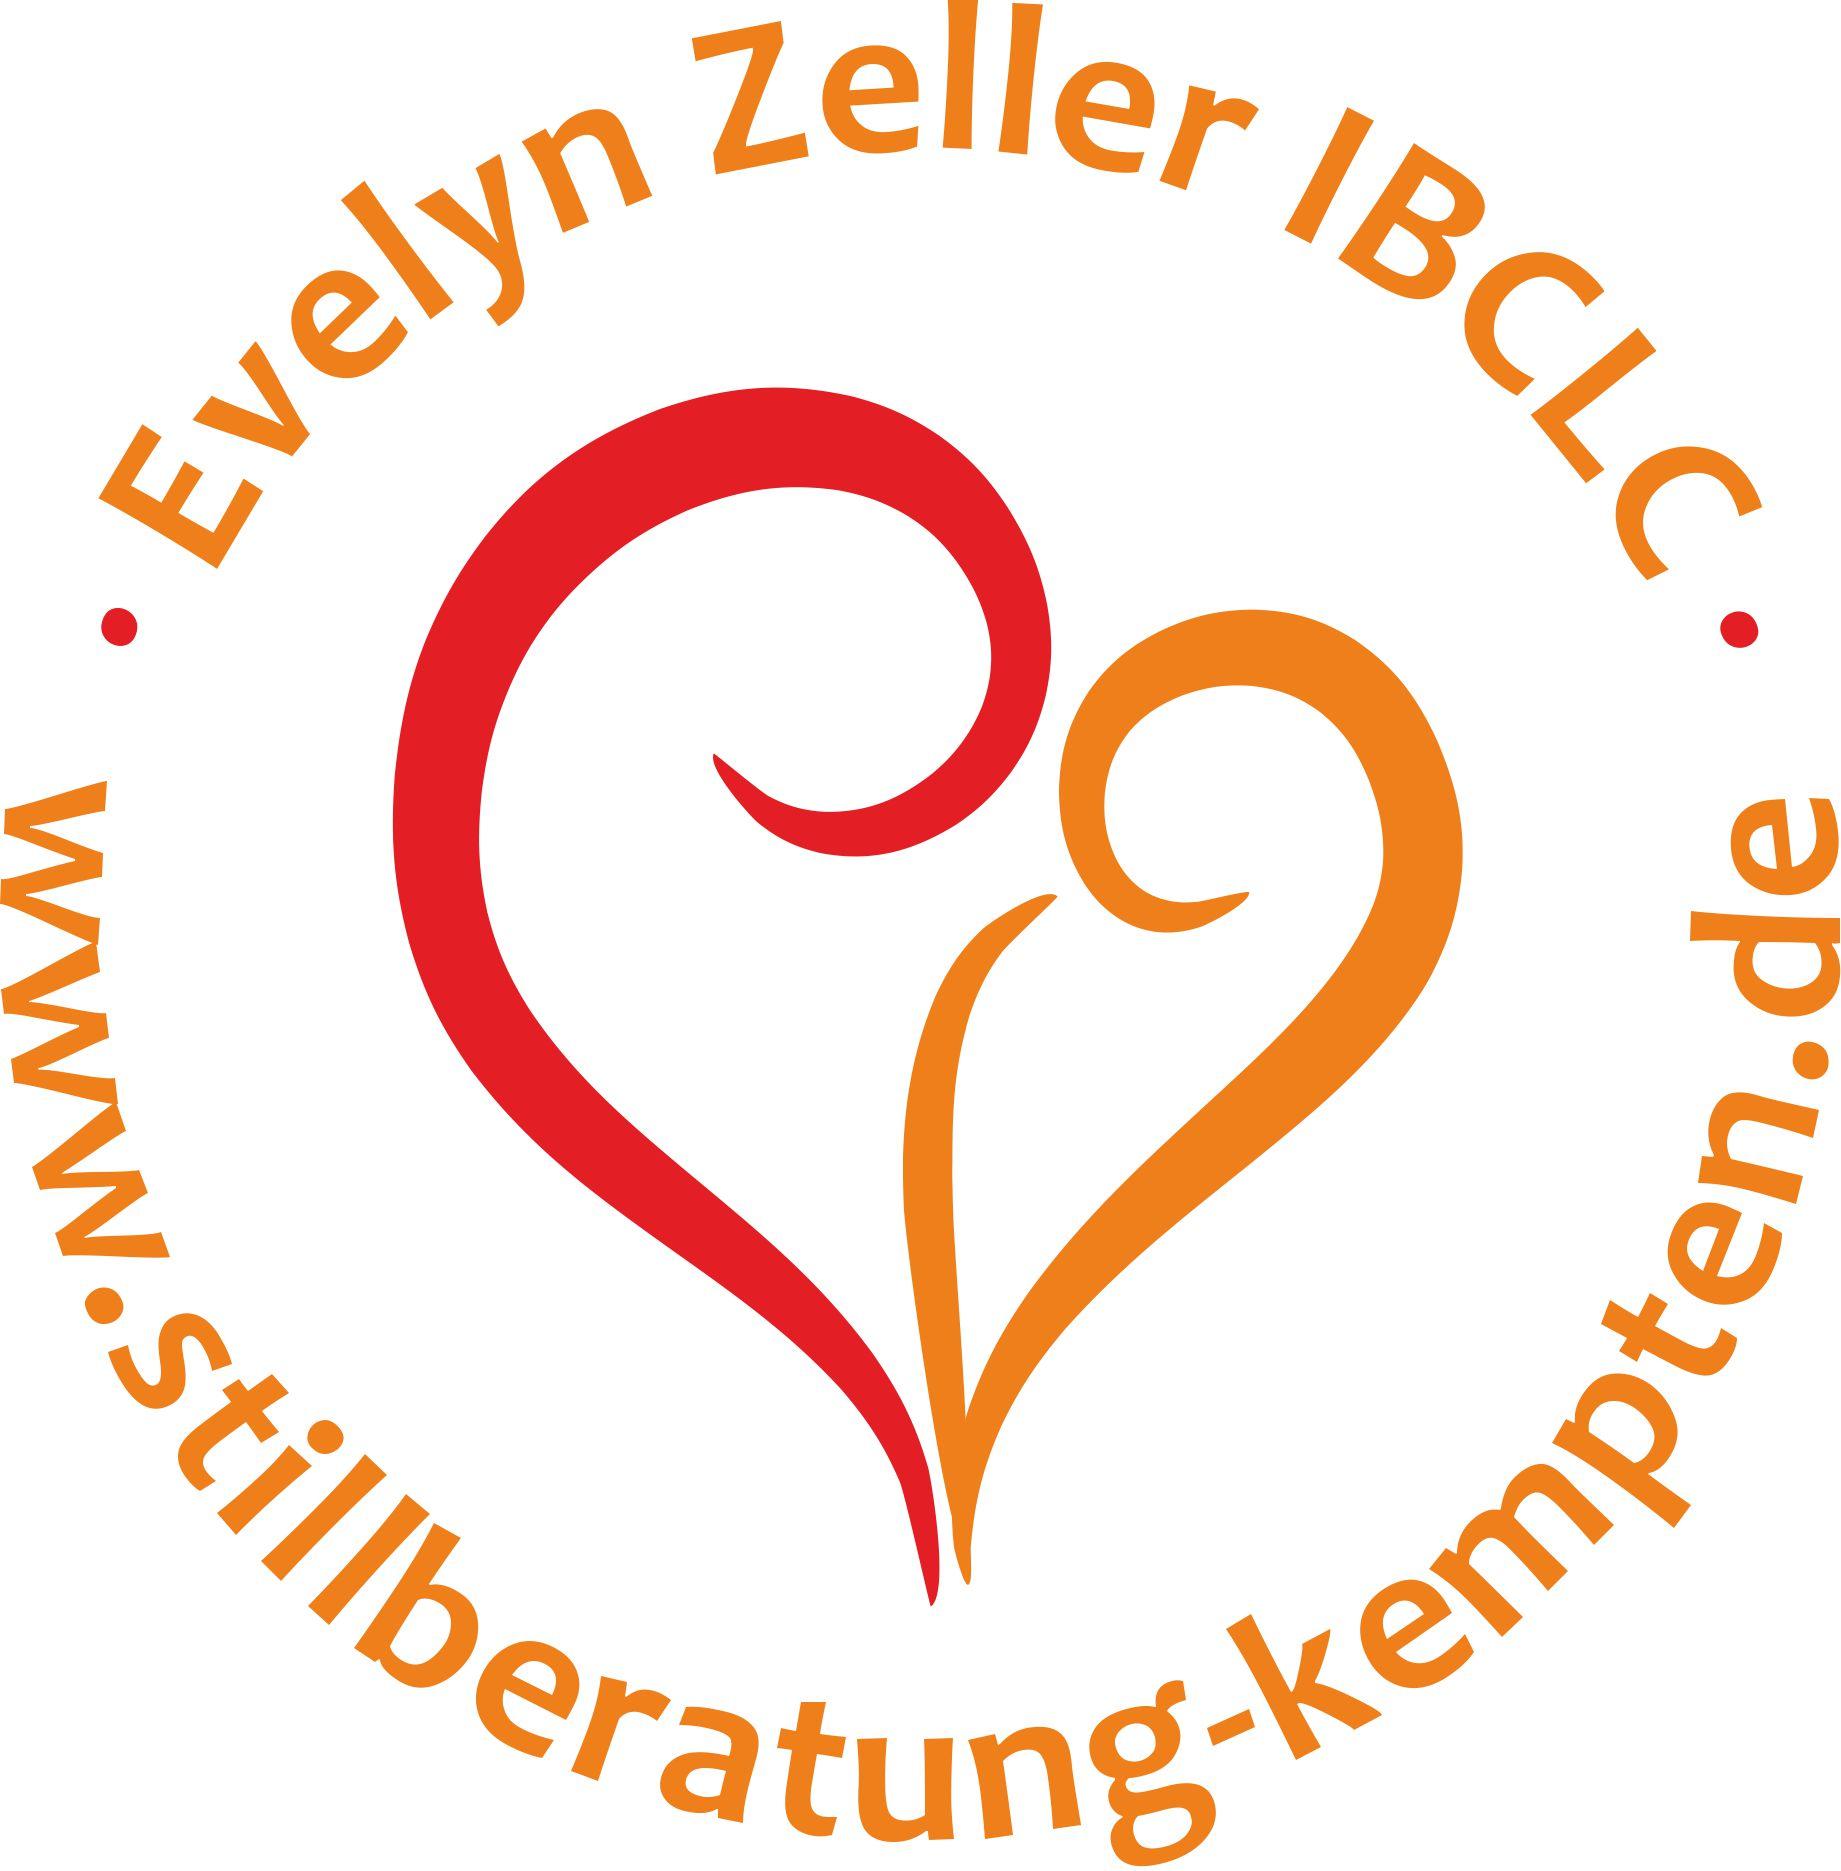 Evelyn Zeller Stillberatung Kempten